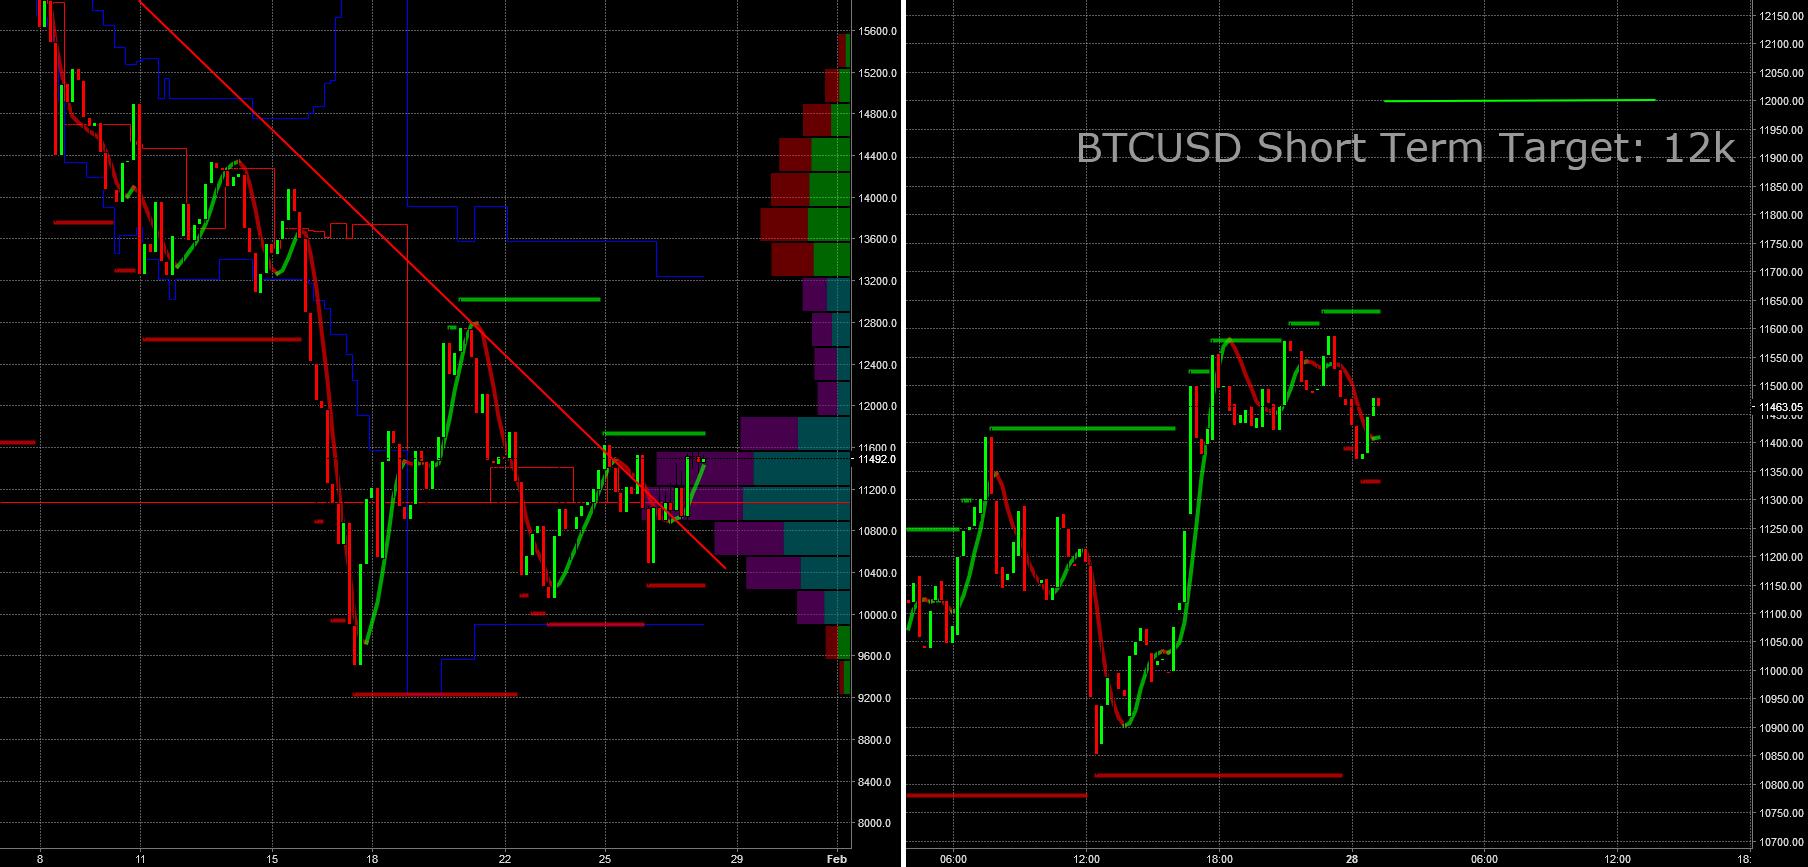 USDBTC: Short term target 12 k